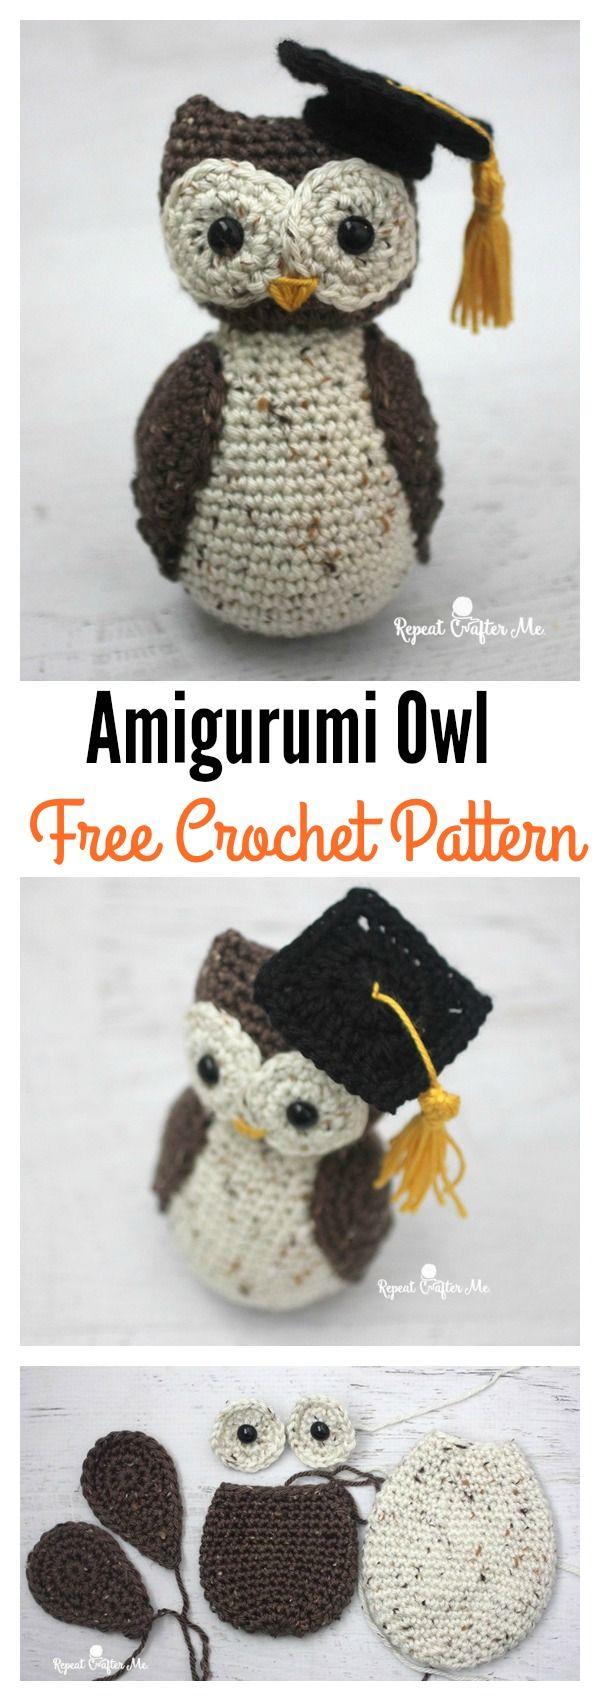 Adorable Crochet Amigurumi Graduation Owl Free Pattern | Pinterest ...